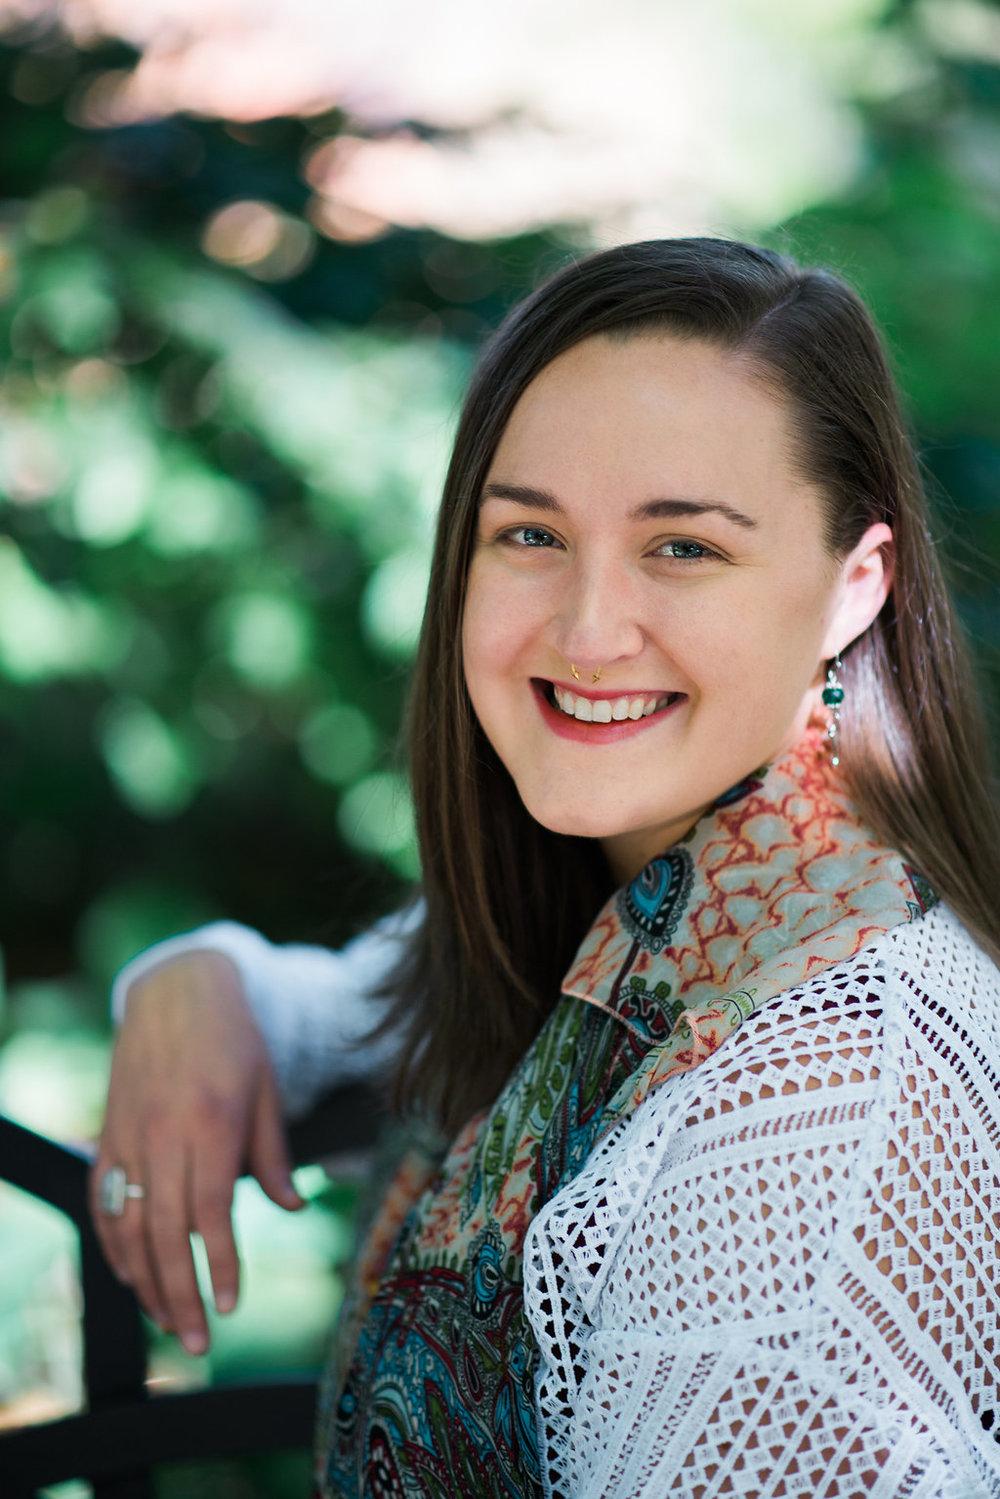 Lexi Steele, Hearthfire Creative, Branding Expert and Company Founder